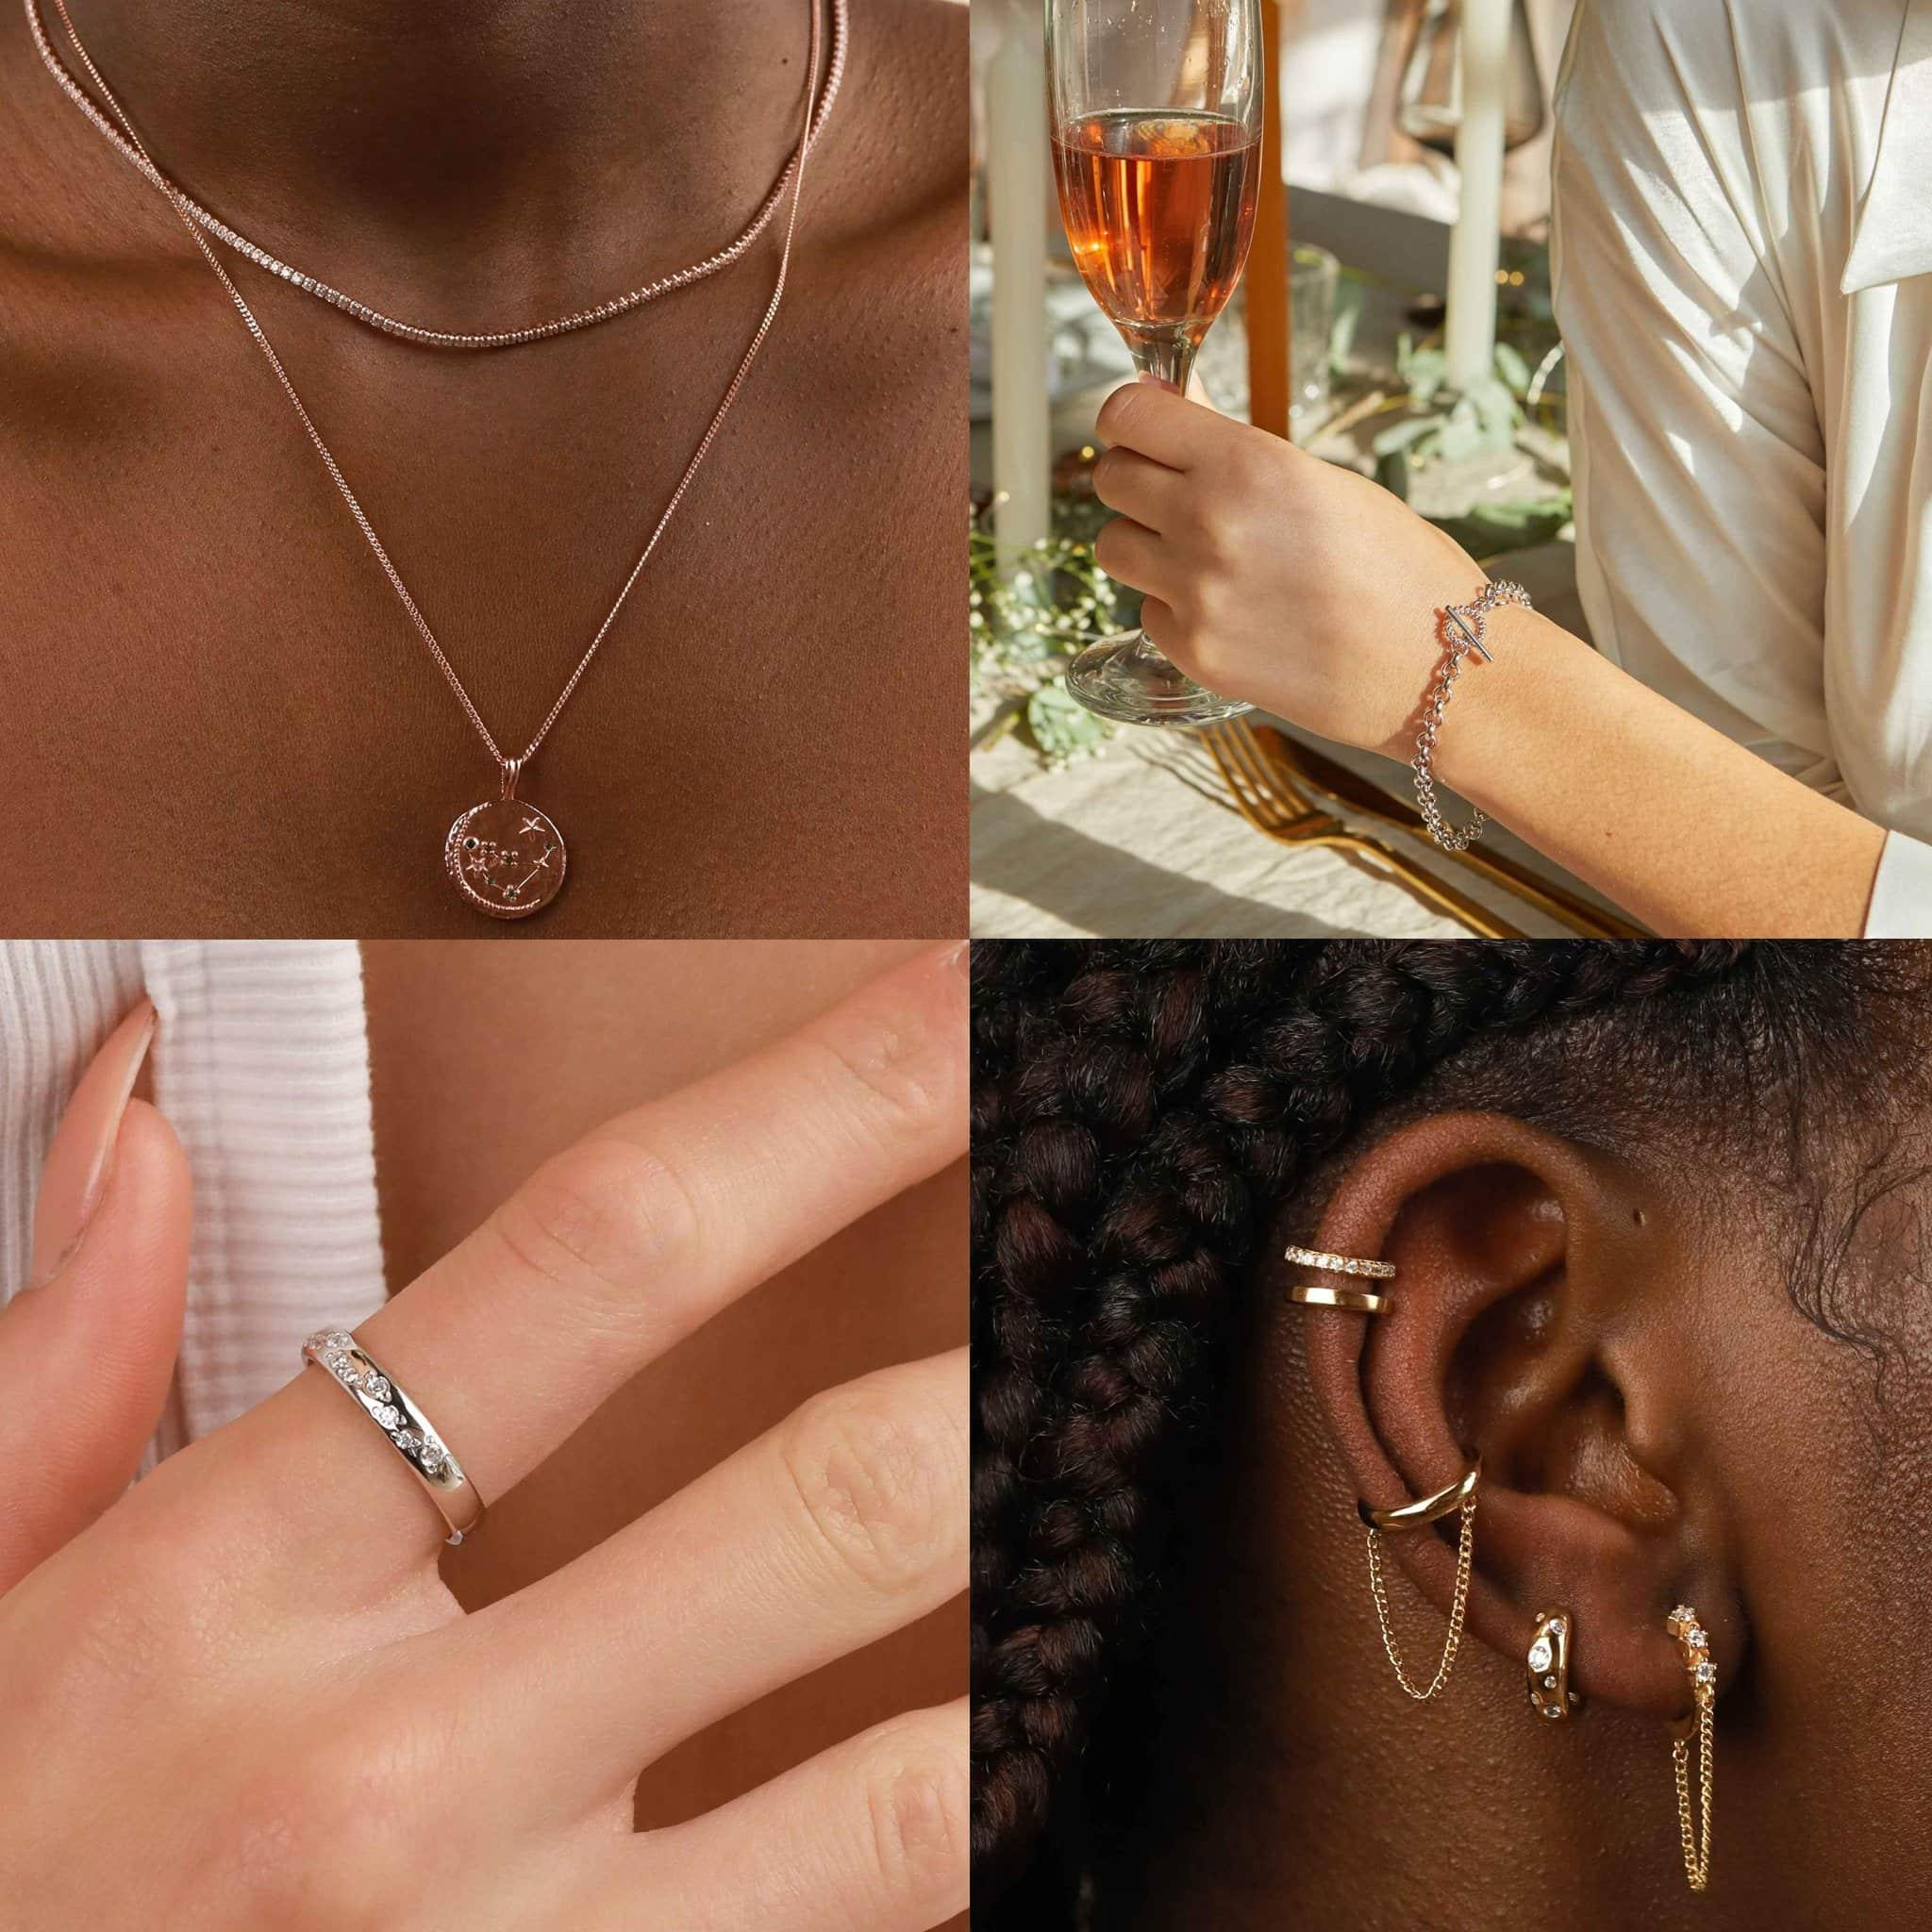 Astrid & Miyu Zodiac Capricorn Pendant Necklace in Rose Gold, $124; Astrid & Miyu Wreath T-Bar Chunky Bracelet in Silver, $77; Astrid & Miyu Gleam Ring in Silver, $77; Astrid & Miyu Twilight Chain Huggies in Gold, $77